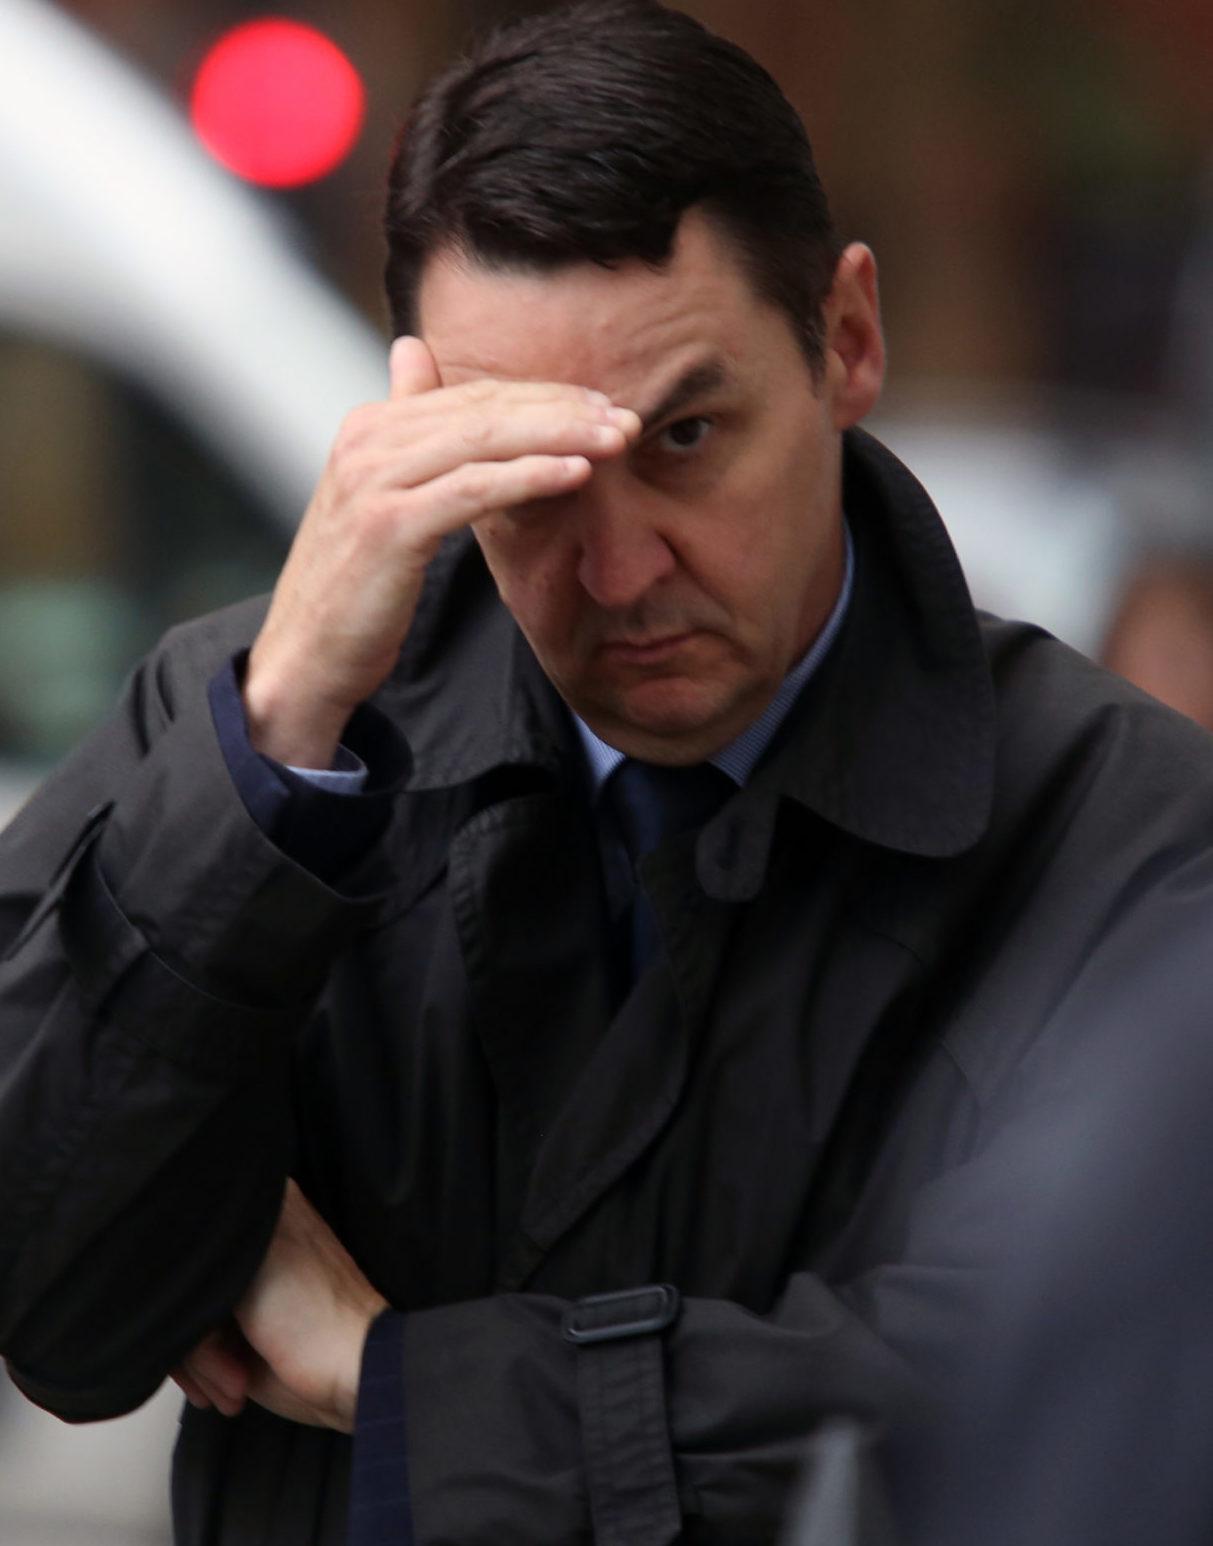 Upskirting Brexit barrister walks free